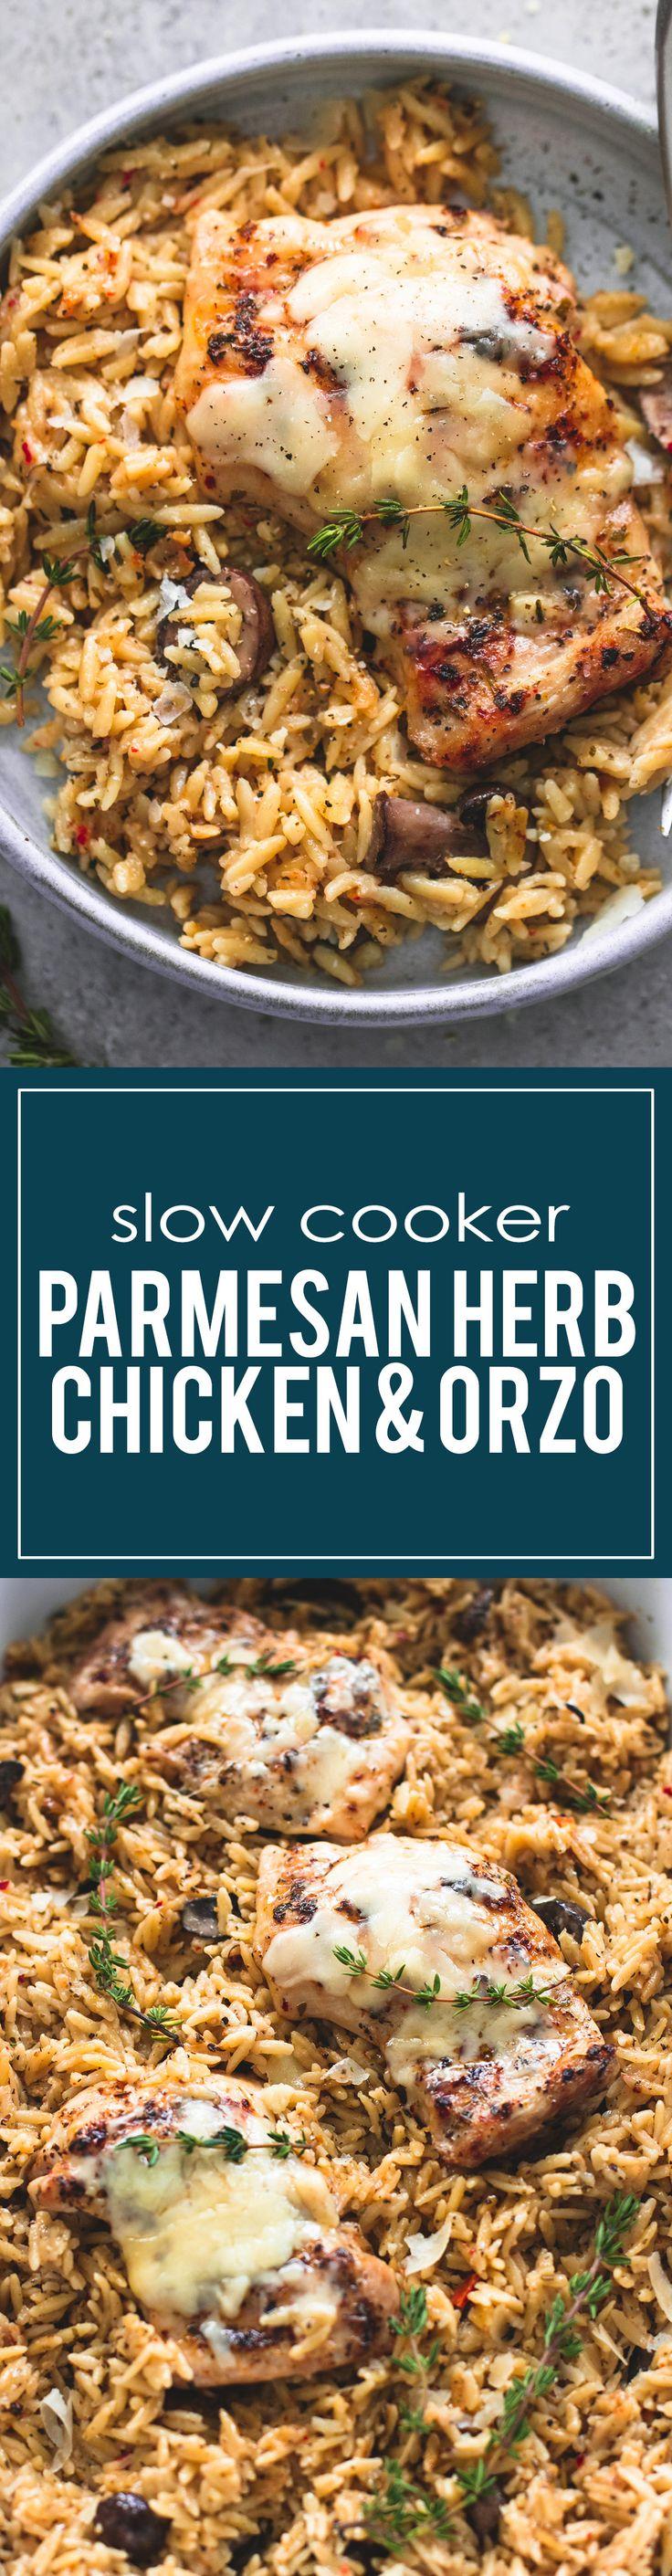 Easy Slow Cooker Parmesan Herb Chicken & Orzo | lecremedelacrumb.com